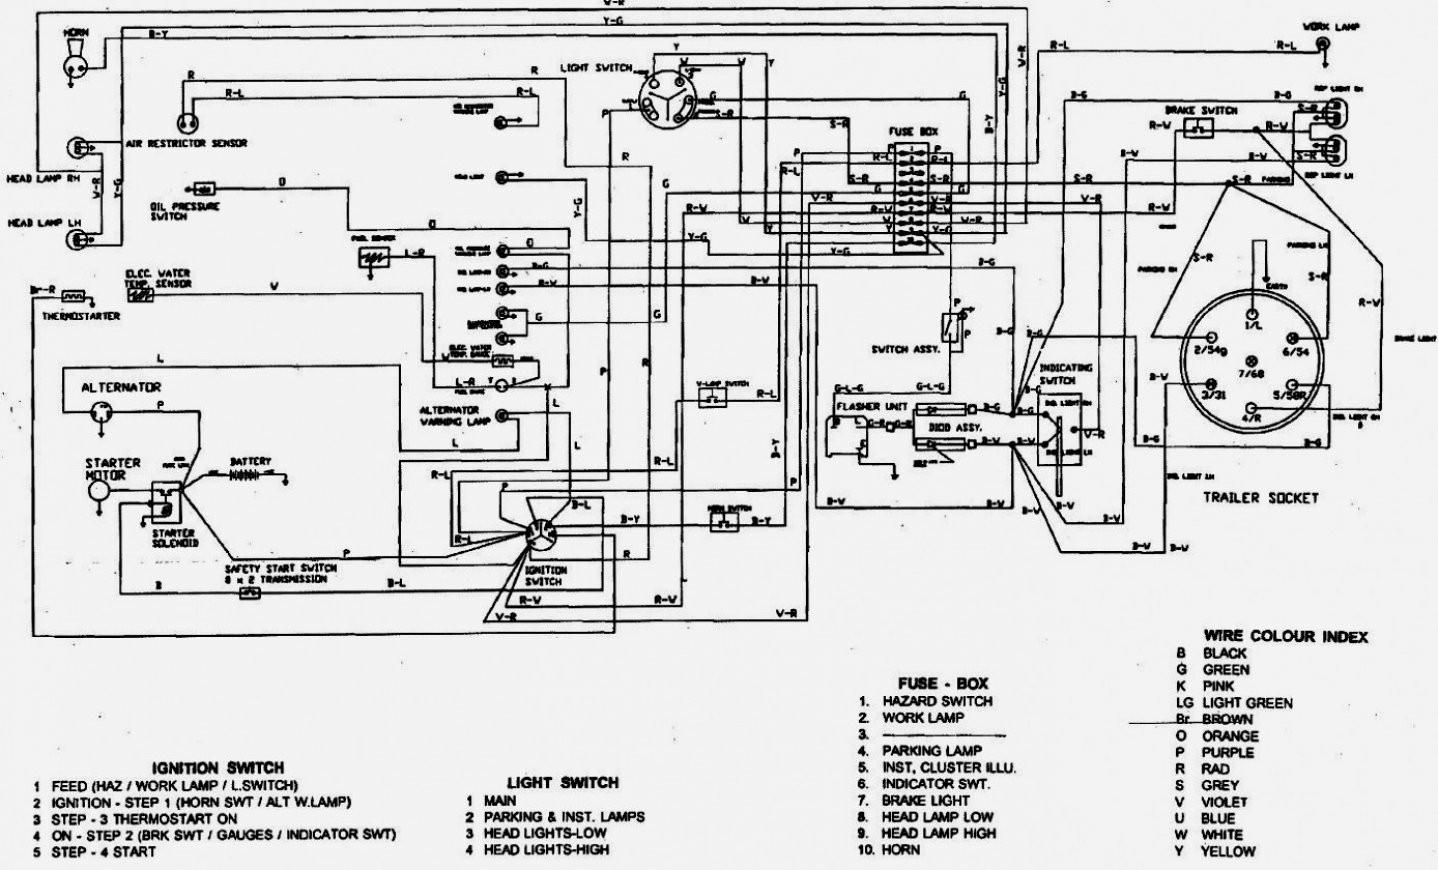 Scott Tv Wiring Diagrams Wiring Diagram List Scott Tv Wiring Diagrams